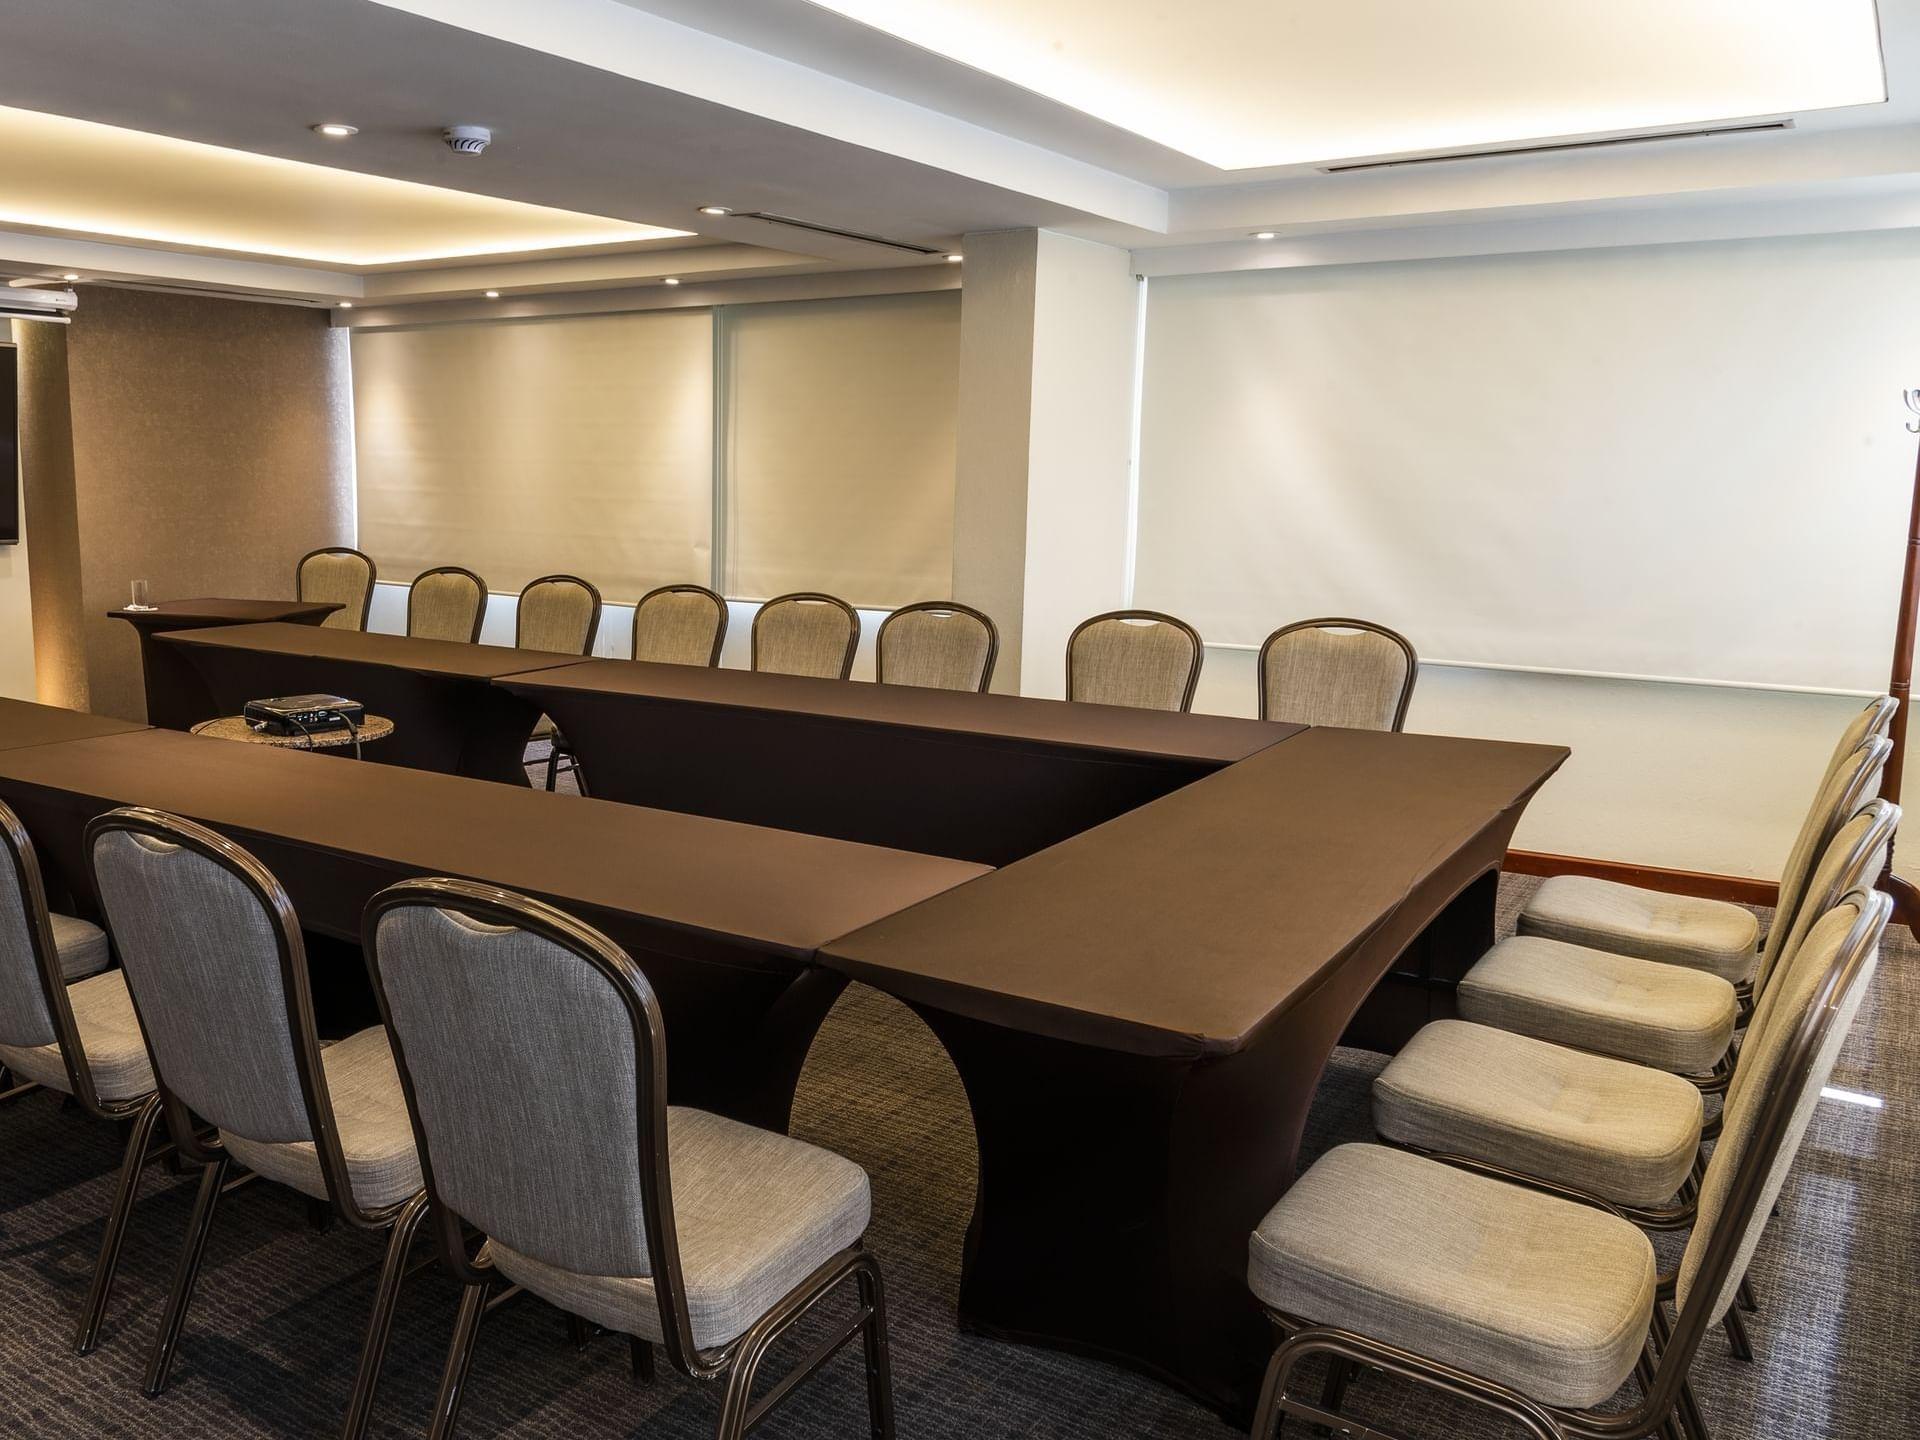 Arranged Las Aguas 2 meeting room at Bogota Plaza Hotel